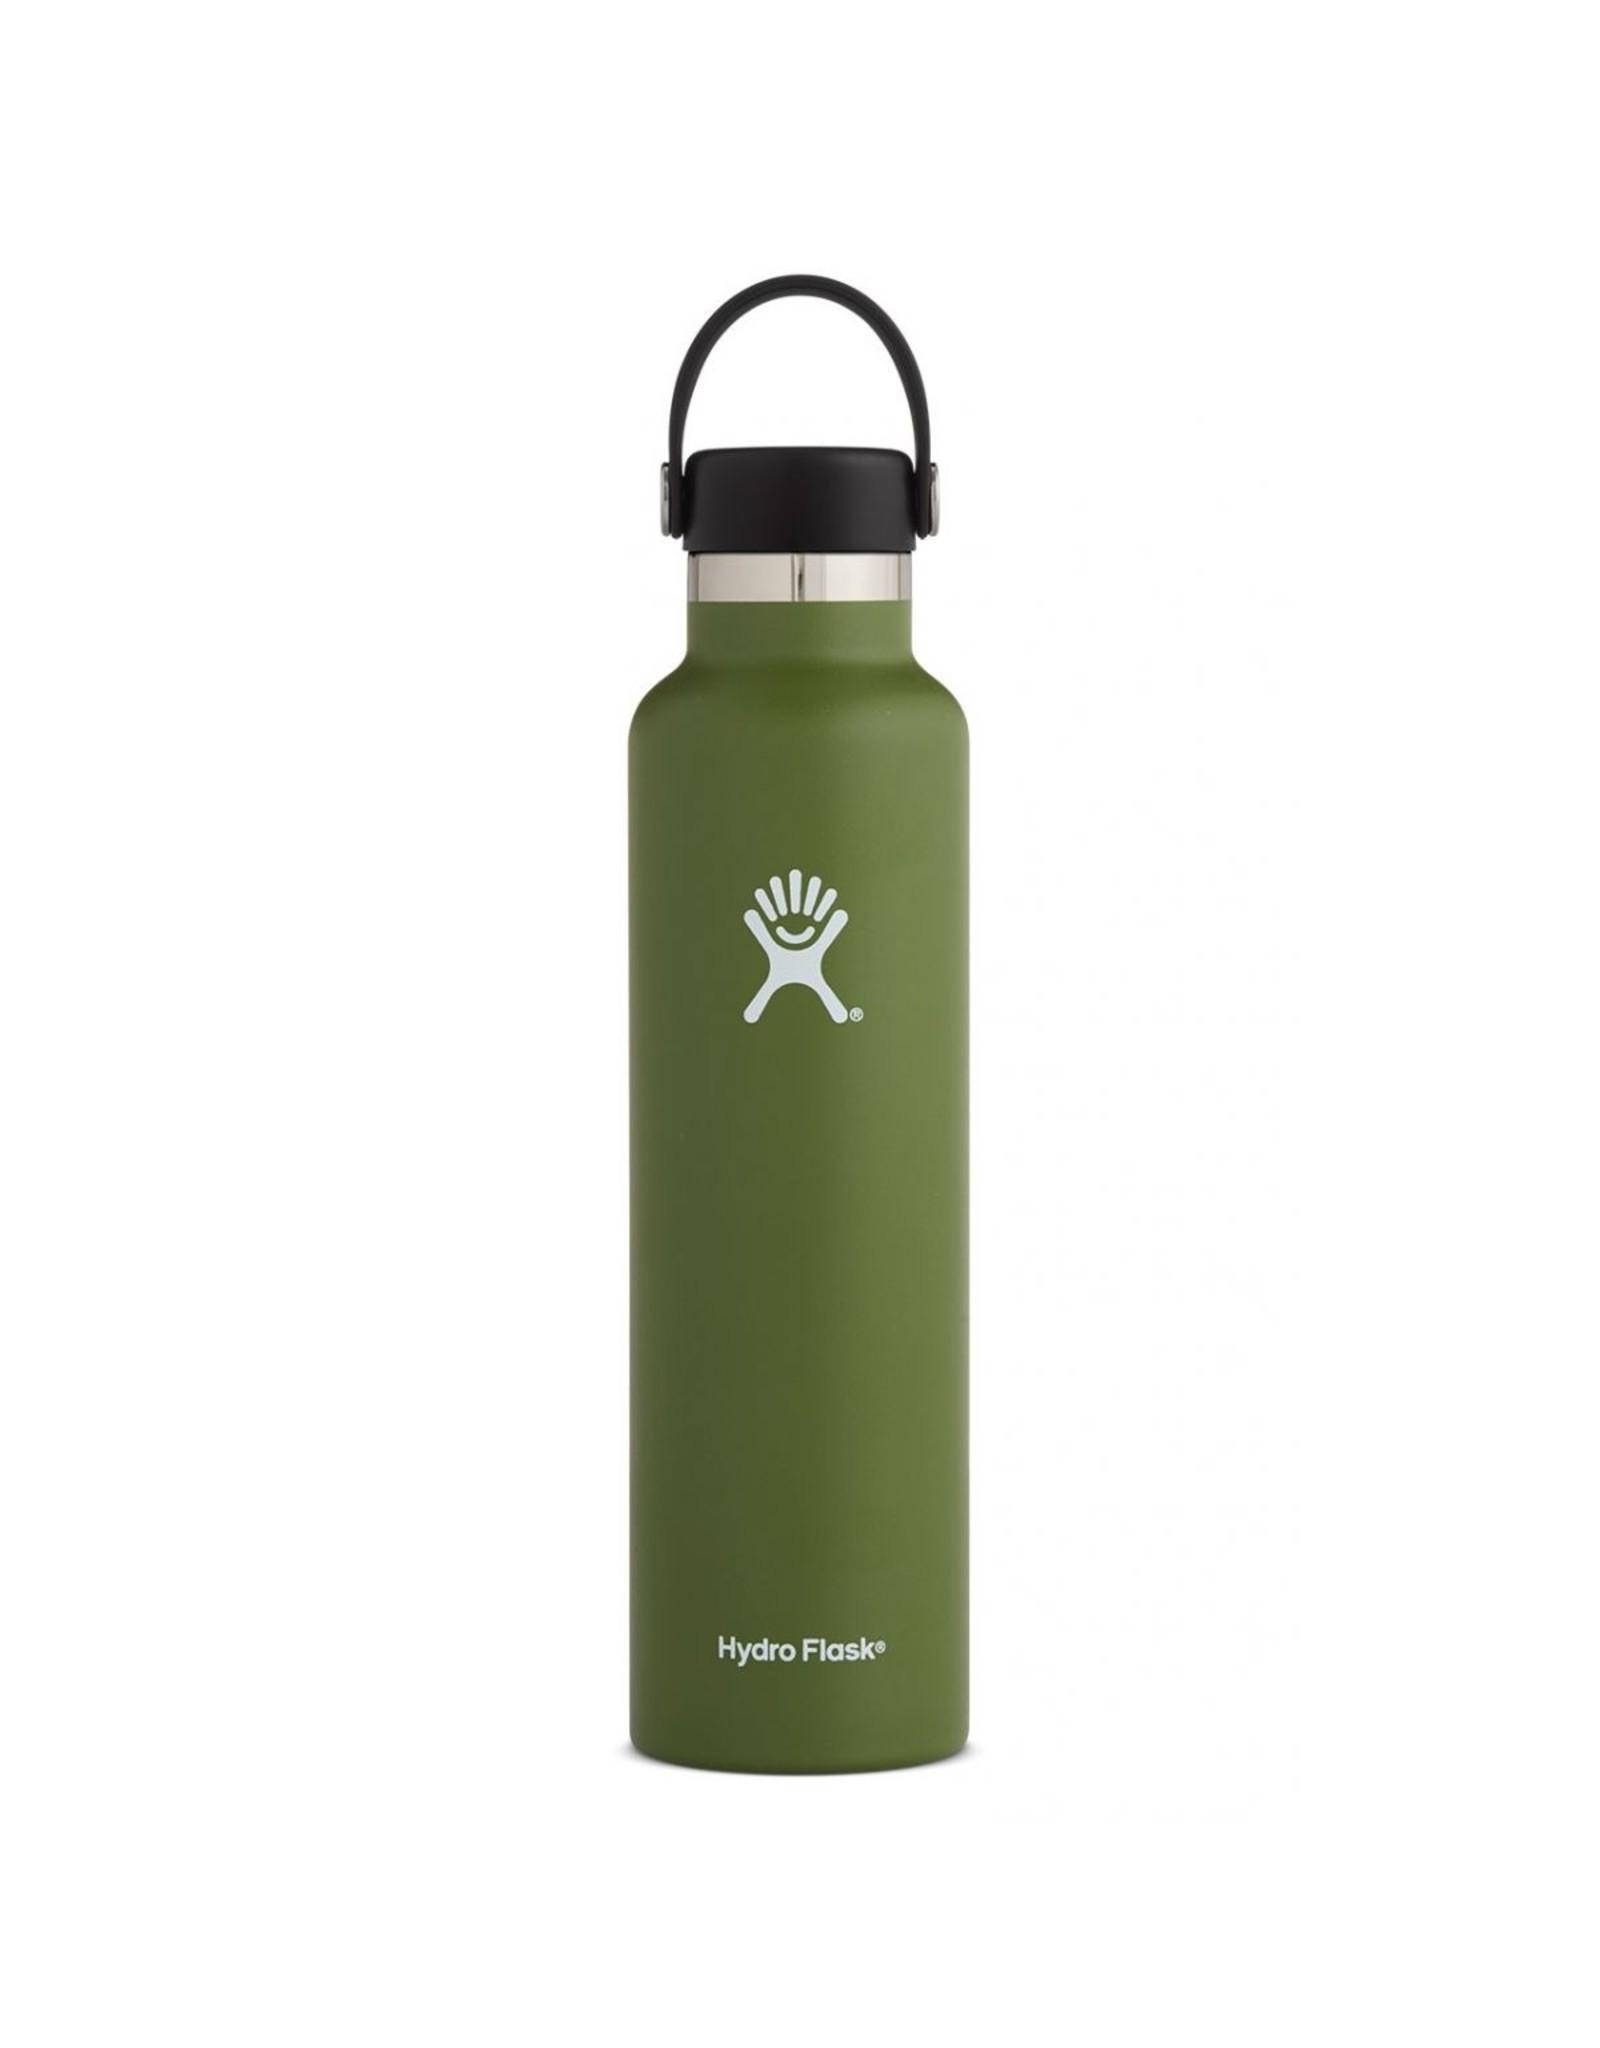 Hydro Flask Hydro Flask 24oz Standard Mouth w/ Flex Cap Olive